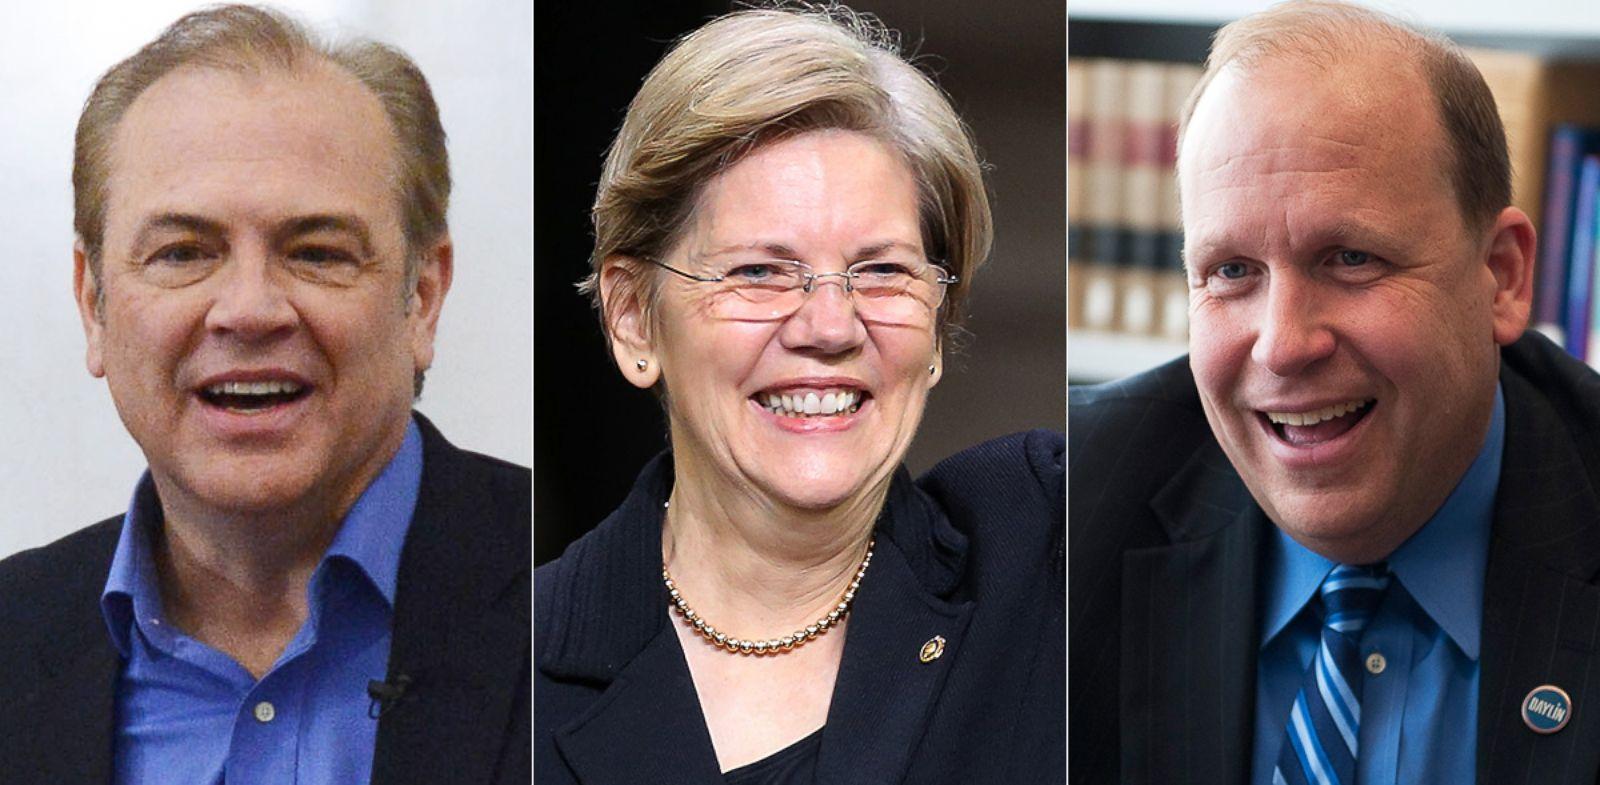 PHOTO: Rick Weiland is pictured on Feb. 4, 2014, in Sioux Falls, S.D. Sen. Elizabeth Warren is pictured on Jan. 6, 2014 in Boston, Mass. Daylin Leach is pictured on Apr. 23, 2013 in Washington, D.C.